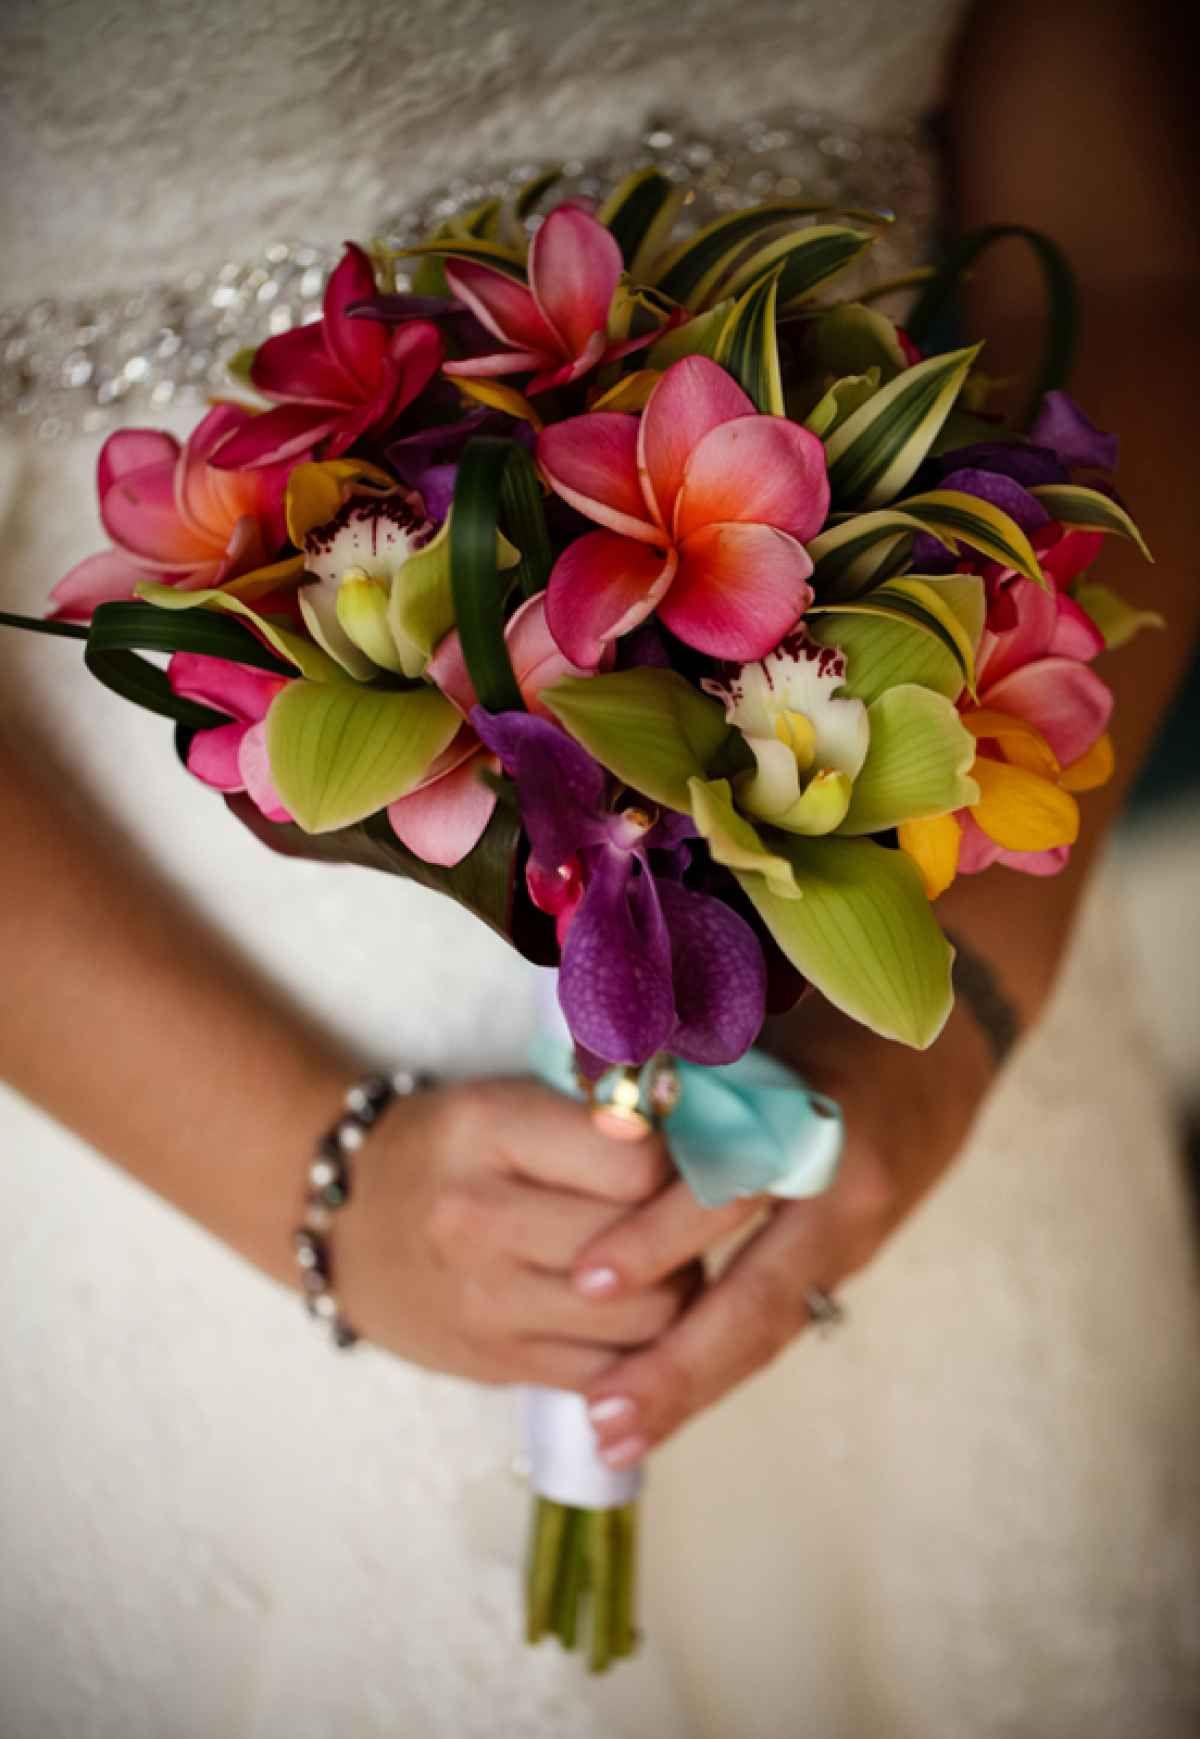 150 Wedding Bouquet Ideas | Garden_Containers | Pinterest | Red ...